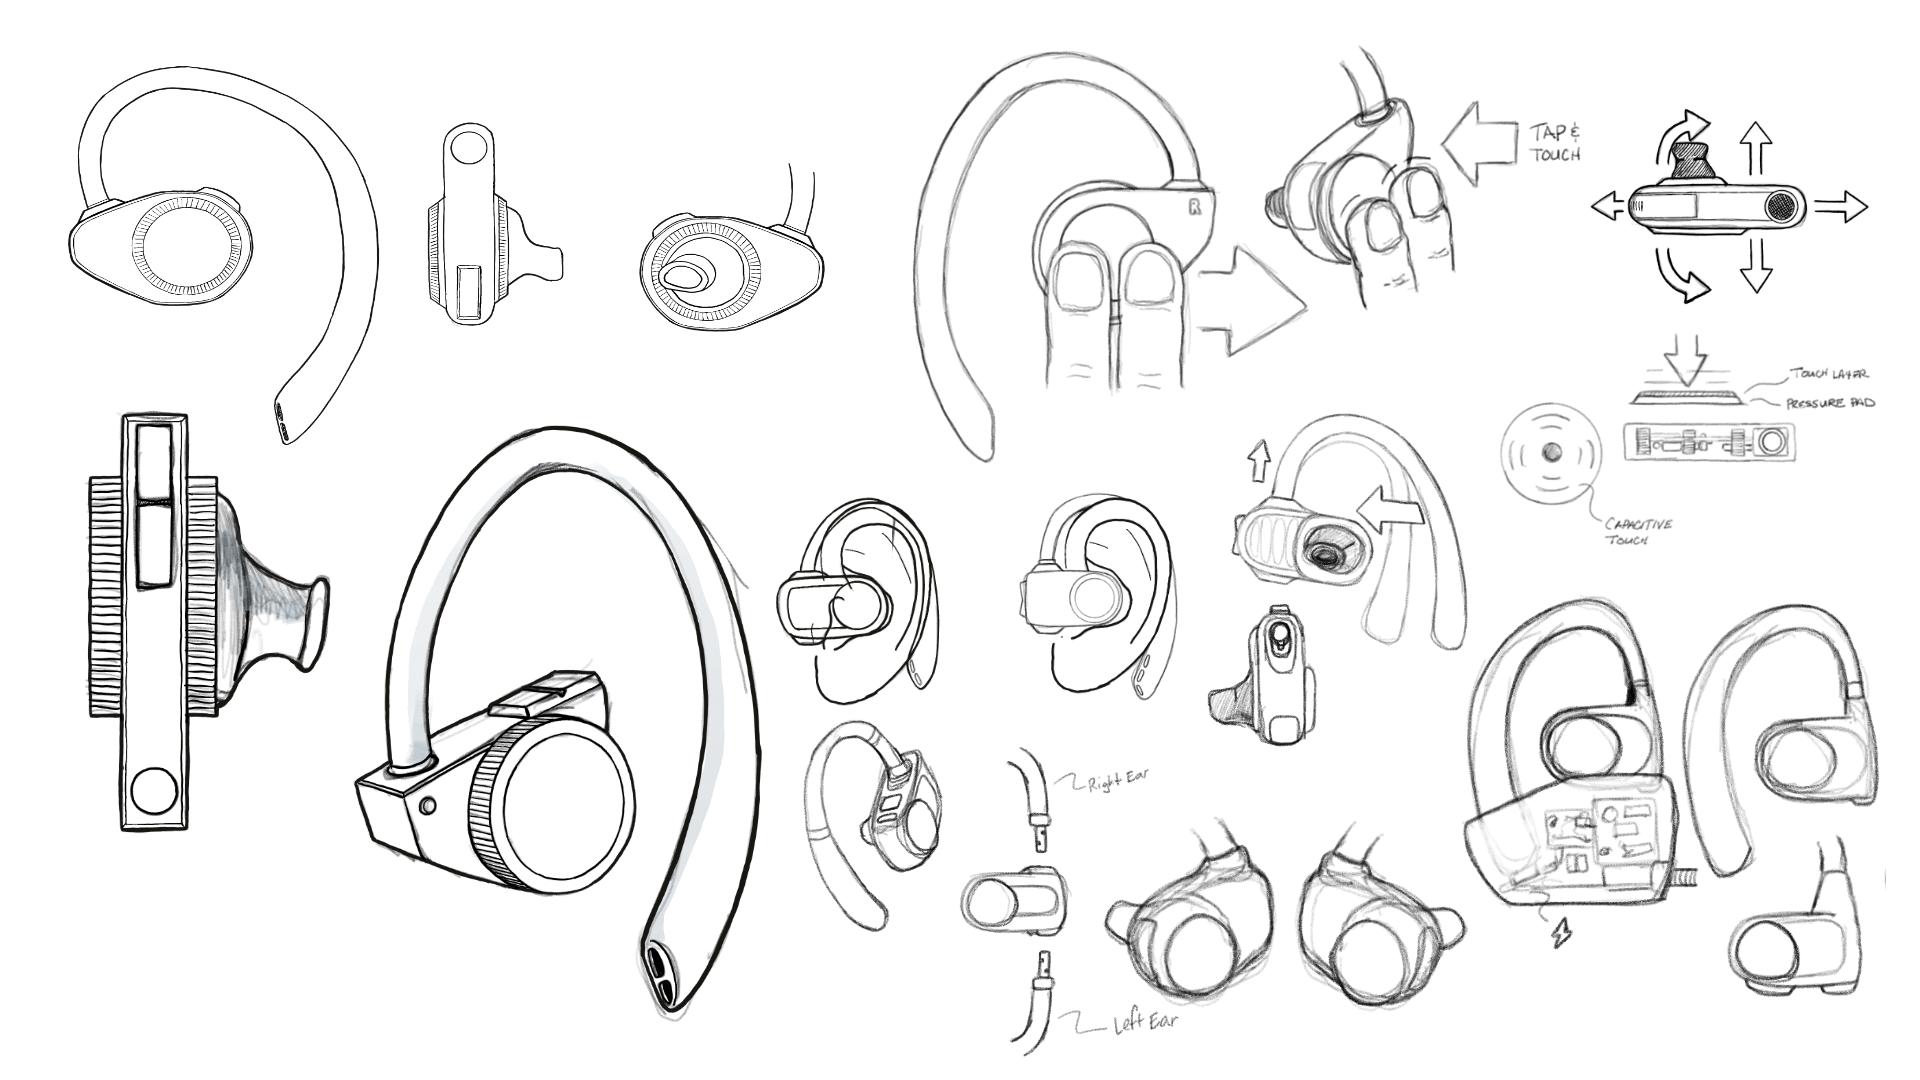 vzc-headphones-1.png